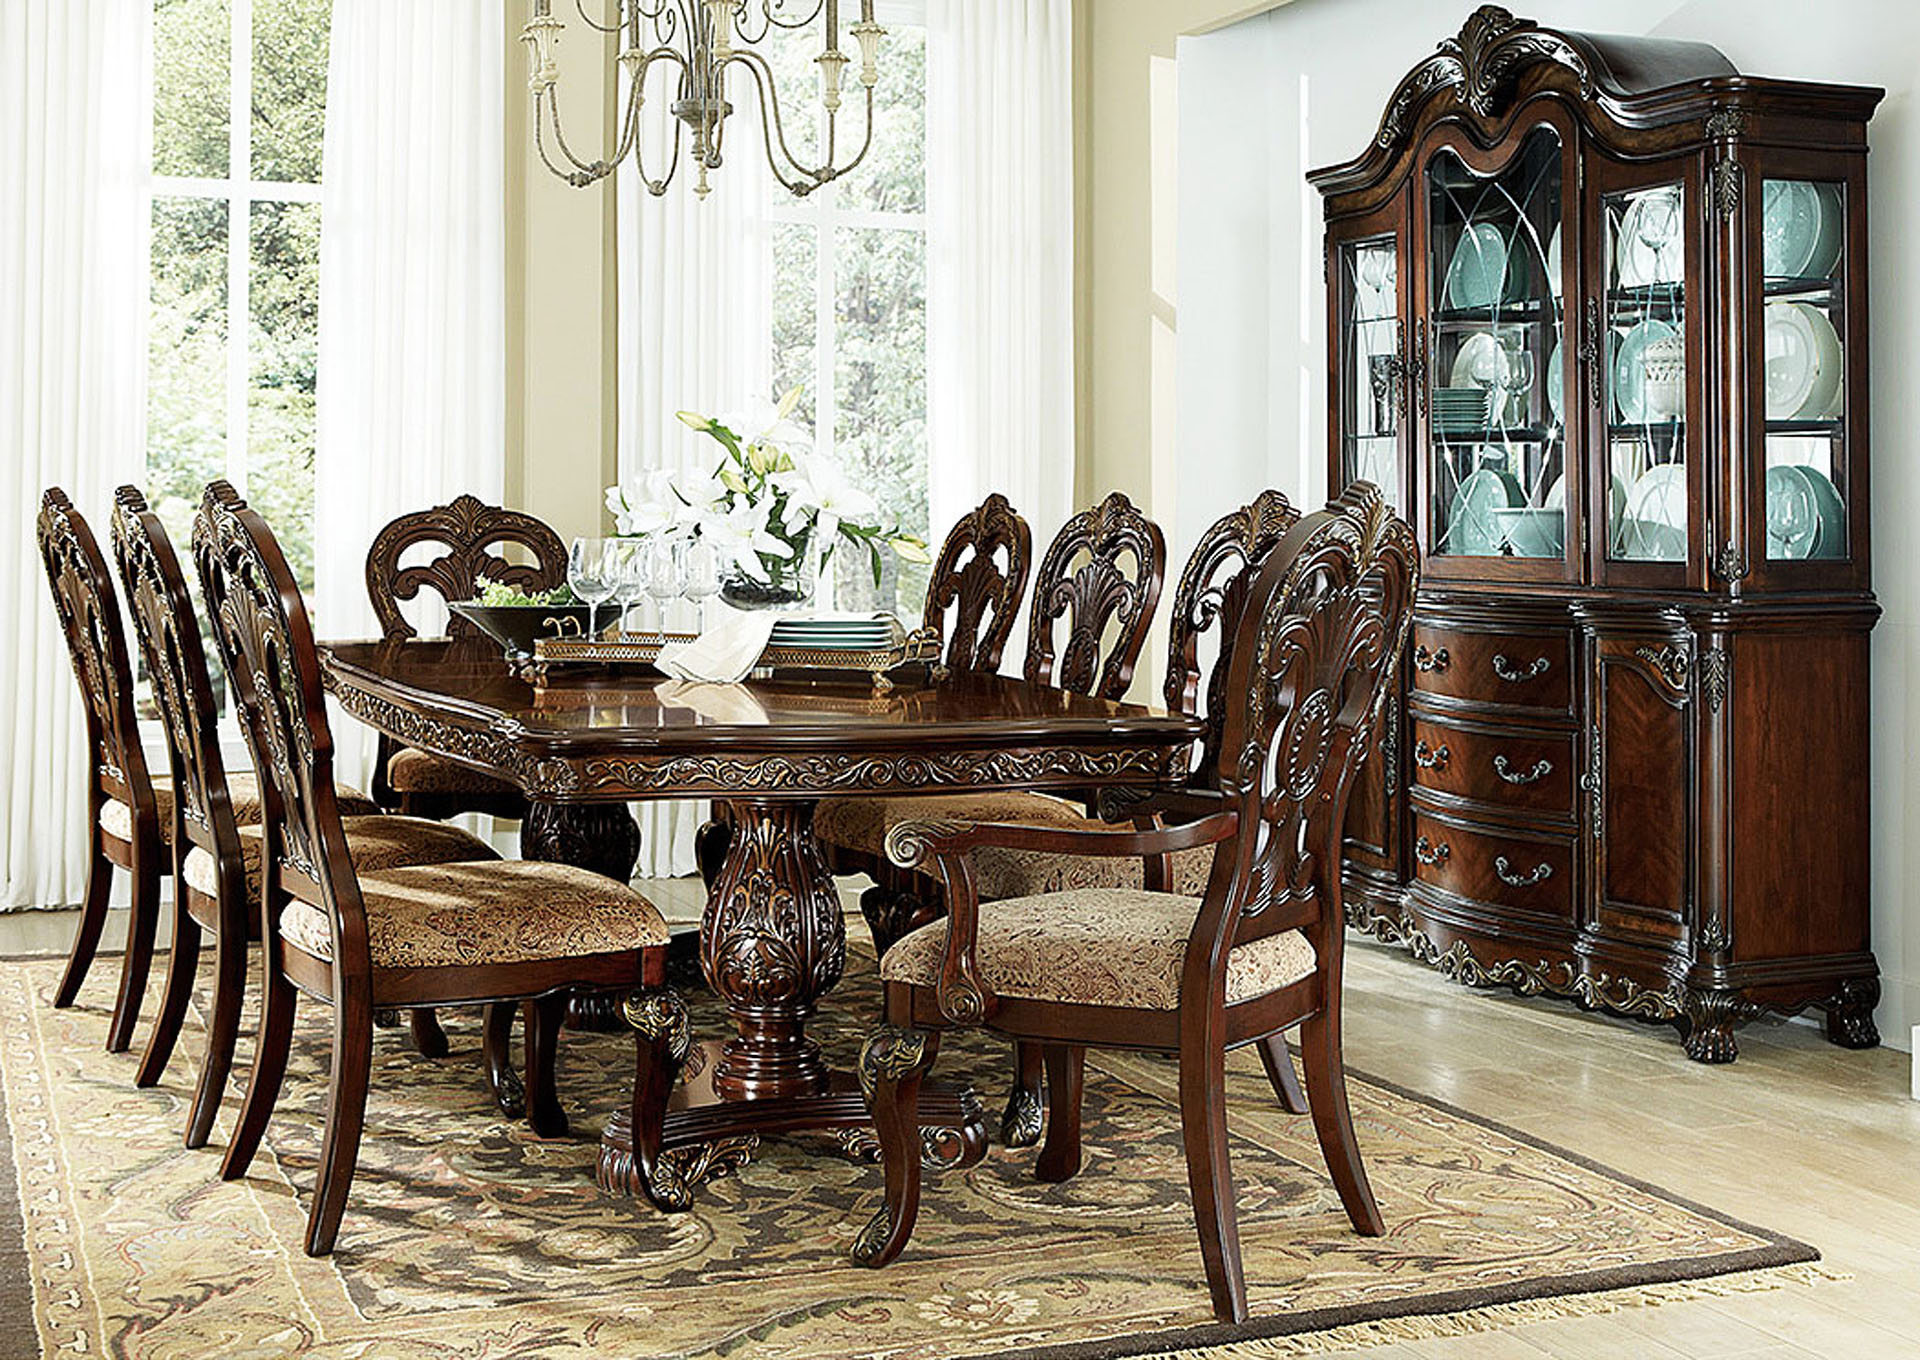 Hot Buys Furniture >> Hot Buys Furniture | Snellville, GA Deryn Park Dining